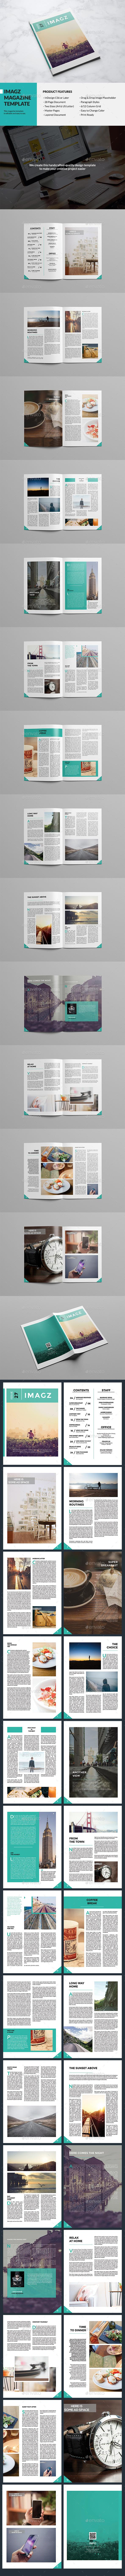 Imagz Magazine - Magazines Print Templates